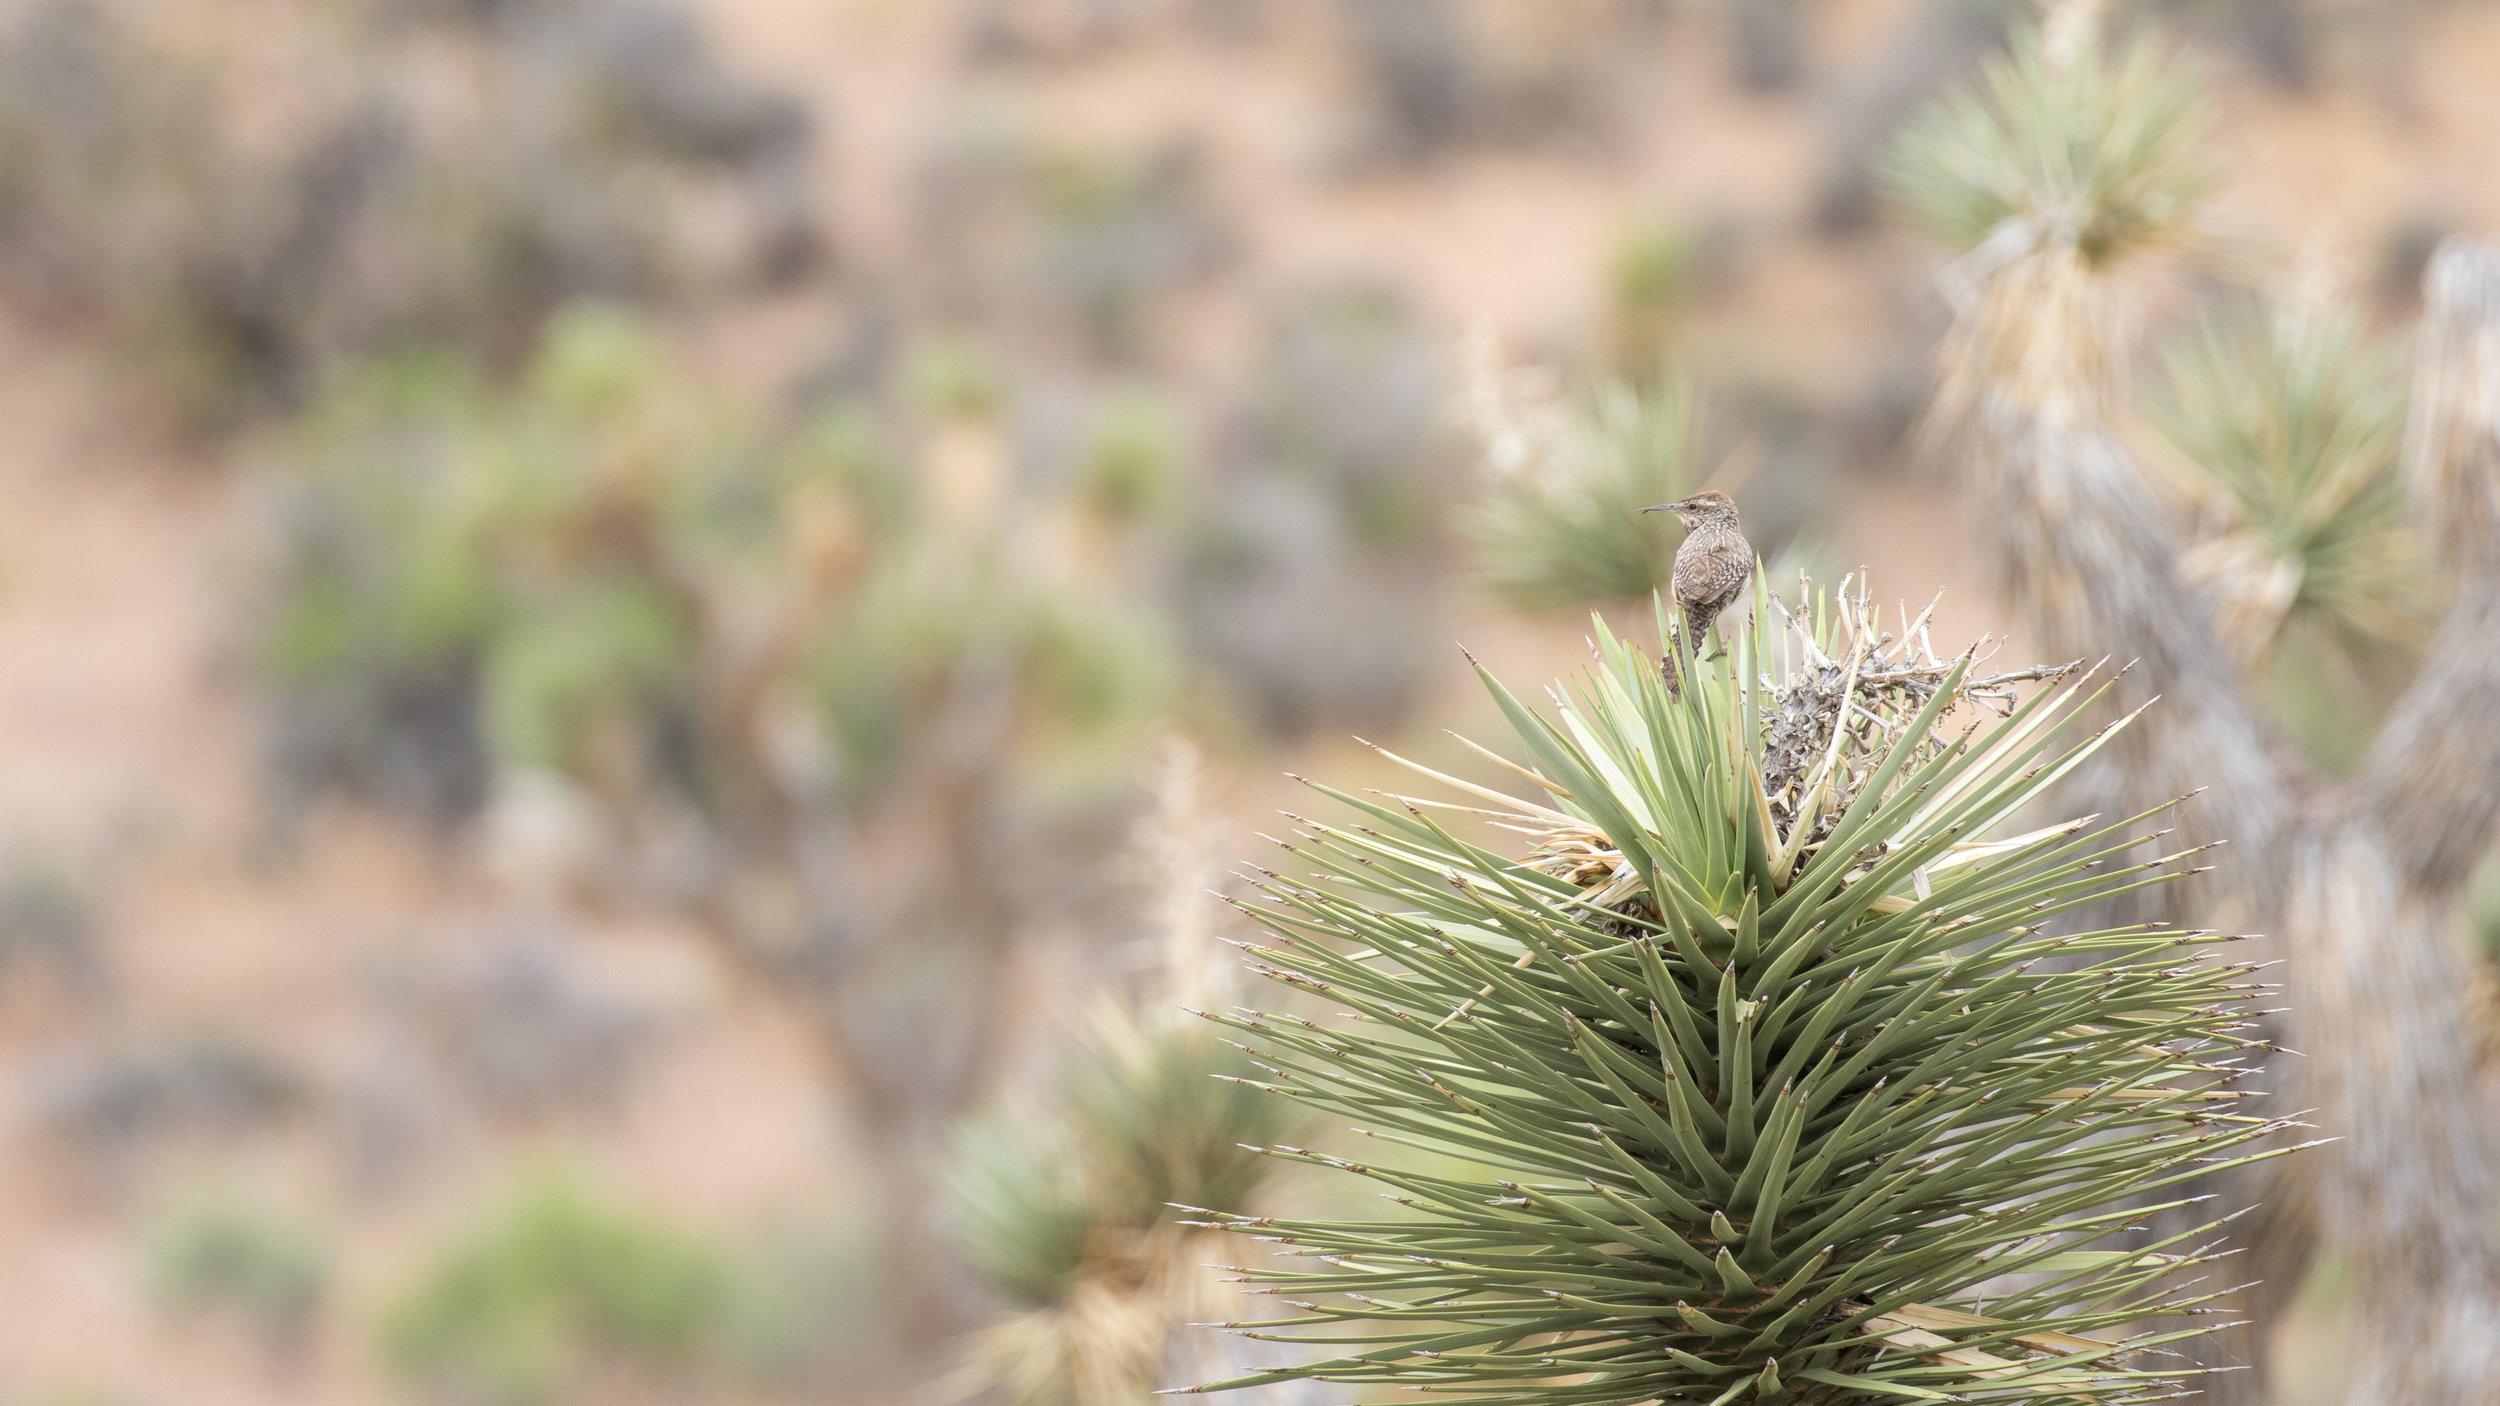 Cactus Wren (Campylorhynchus brunneicapillus) in Joshua Tree National Park, California. Not baited. Not called in.